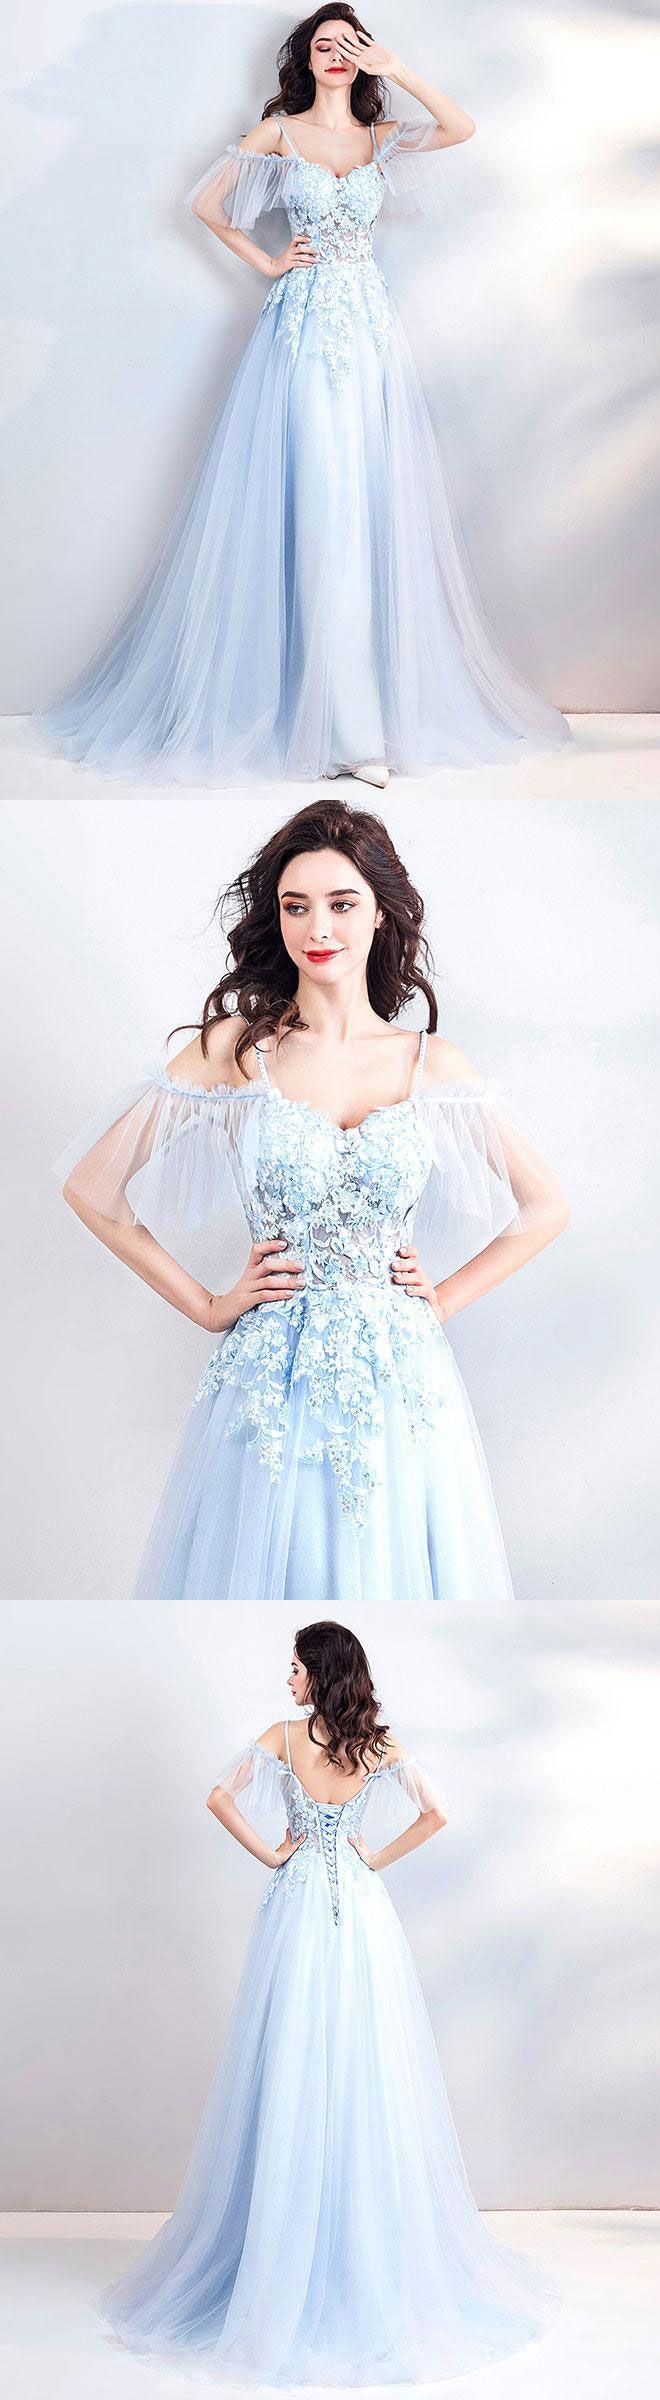 Light blue lace tulle long prom dress evening dress prom dresses